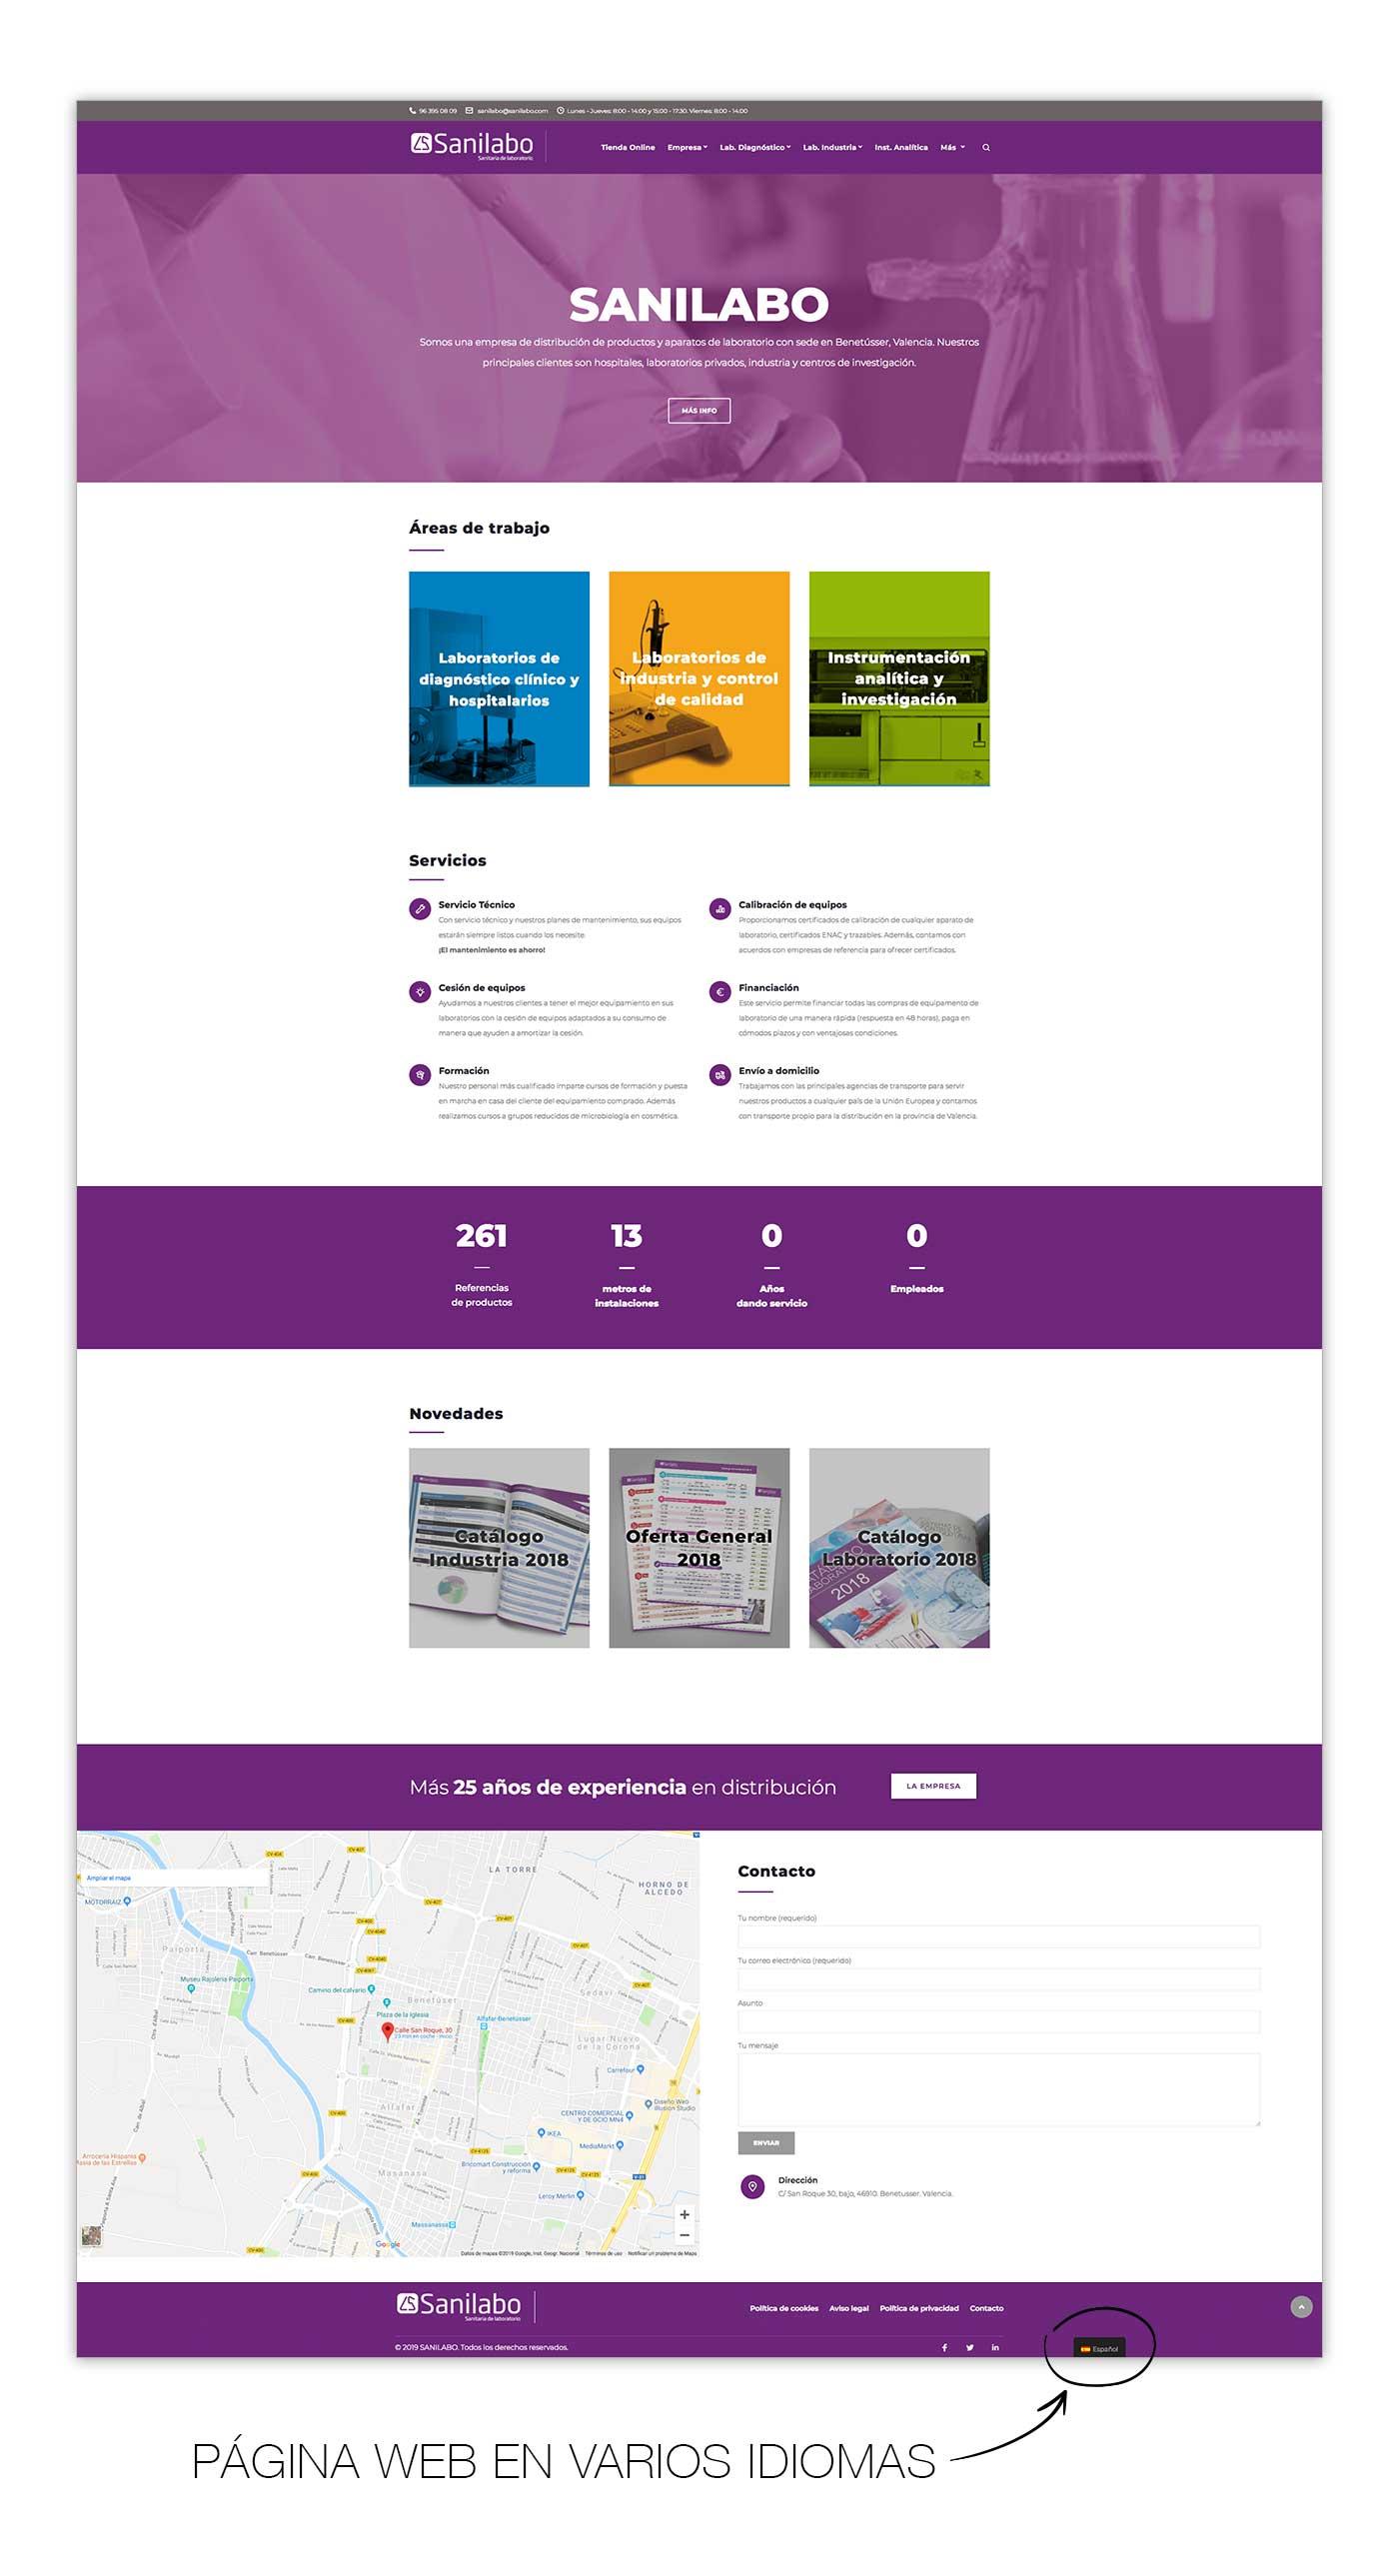 Joan Ibañez Diseño y Marketing - Web responsive